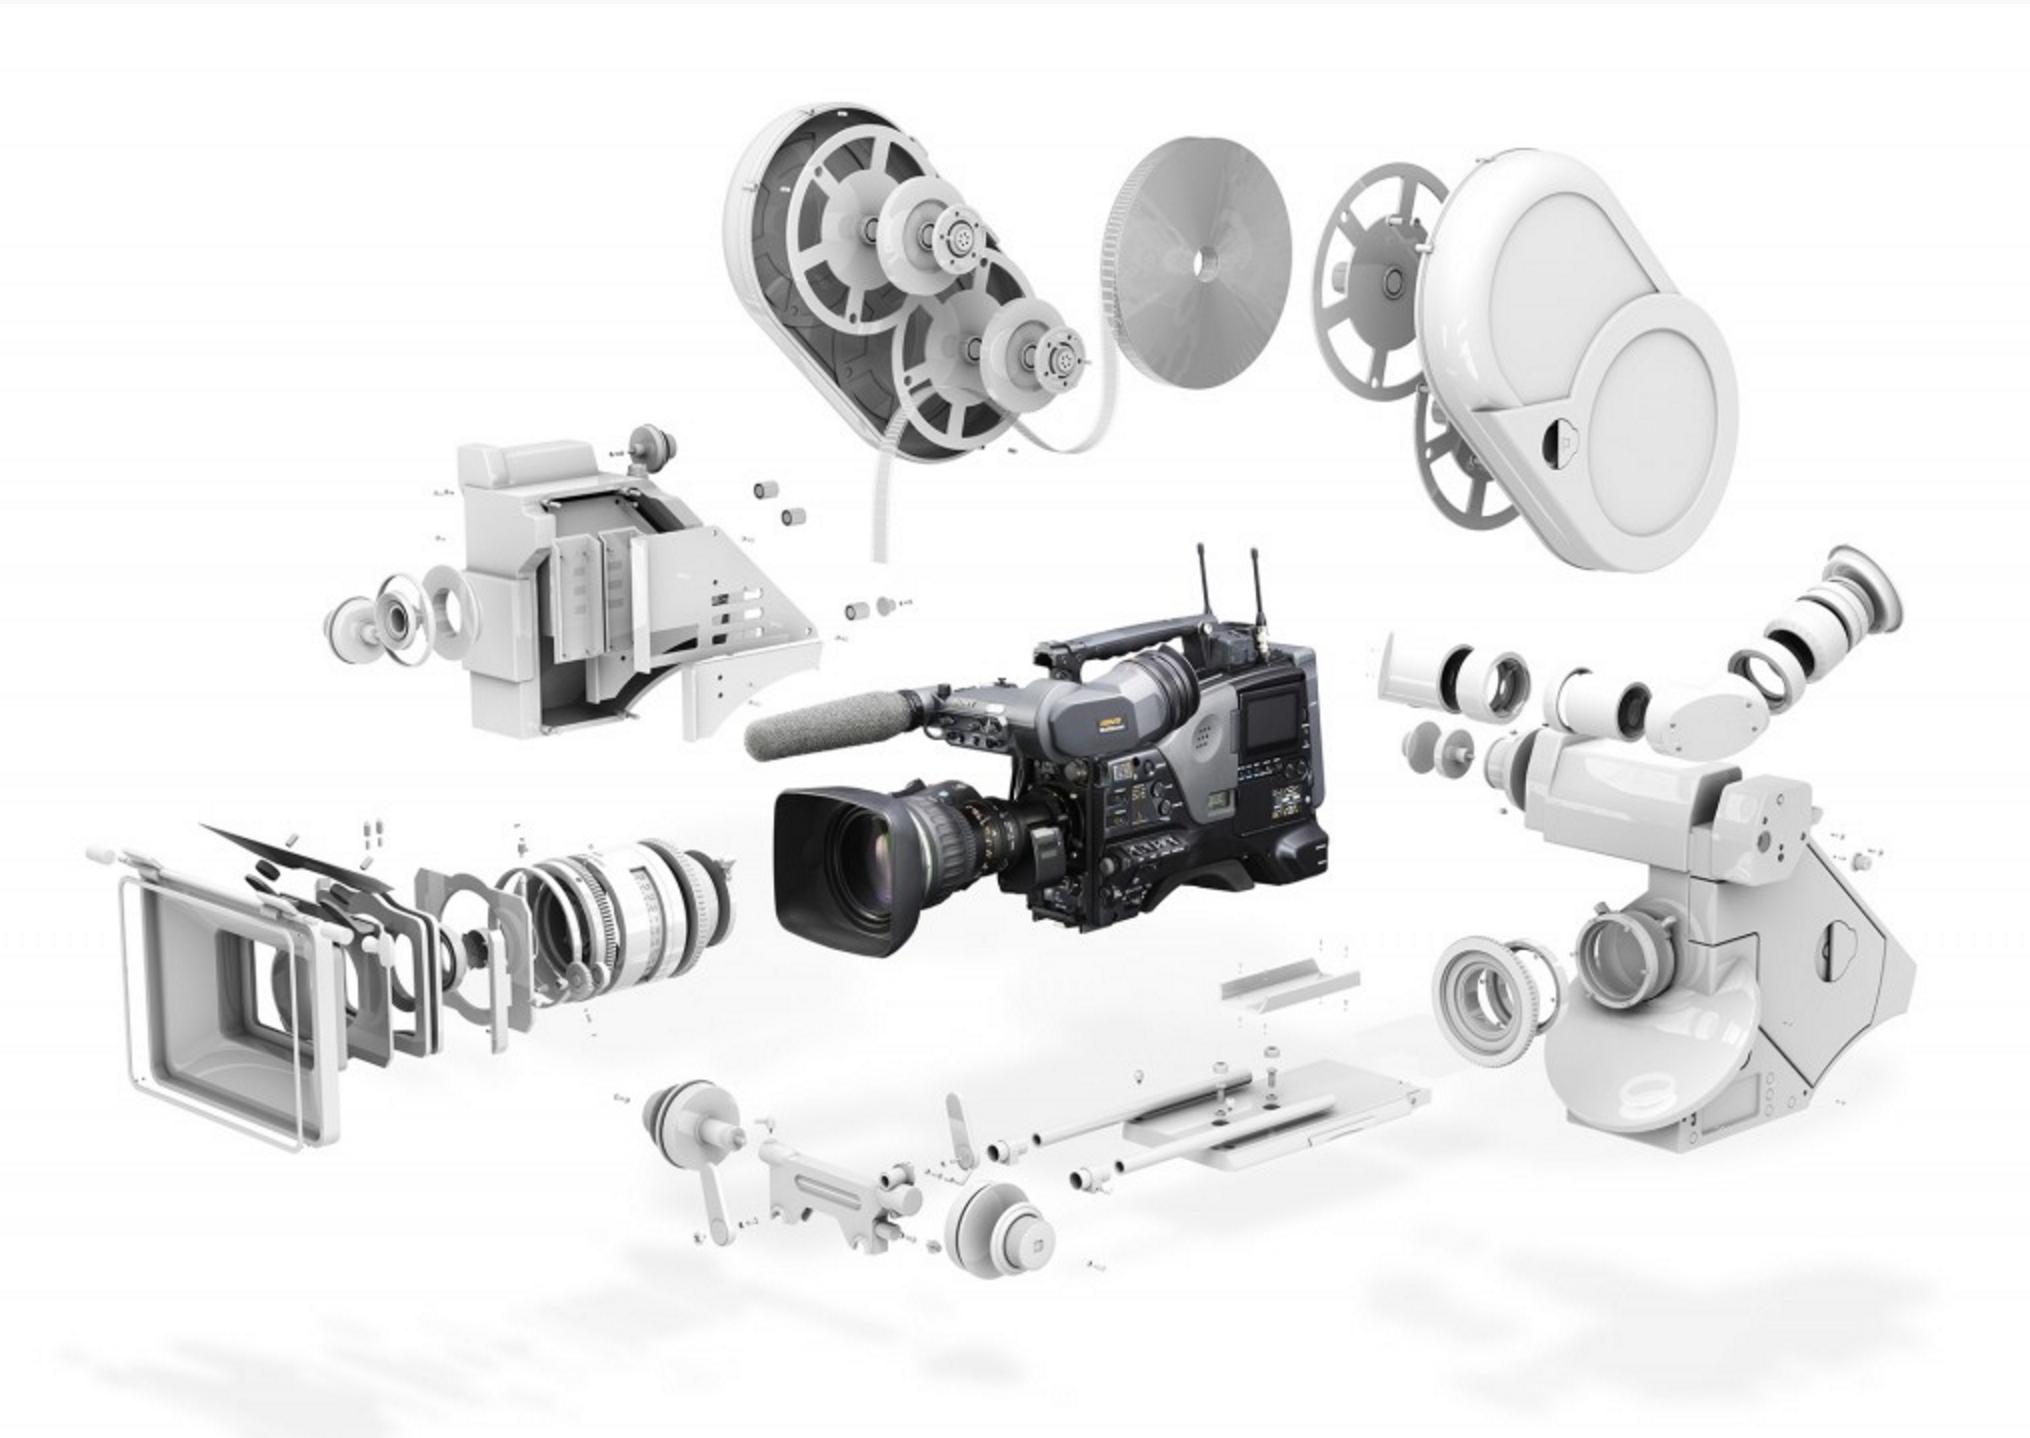 Videocamera parts